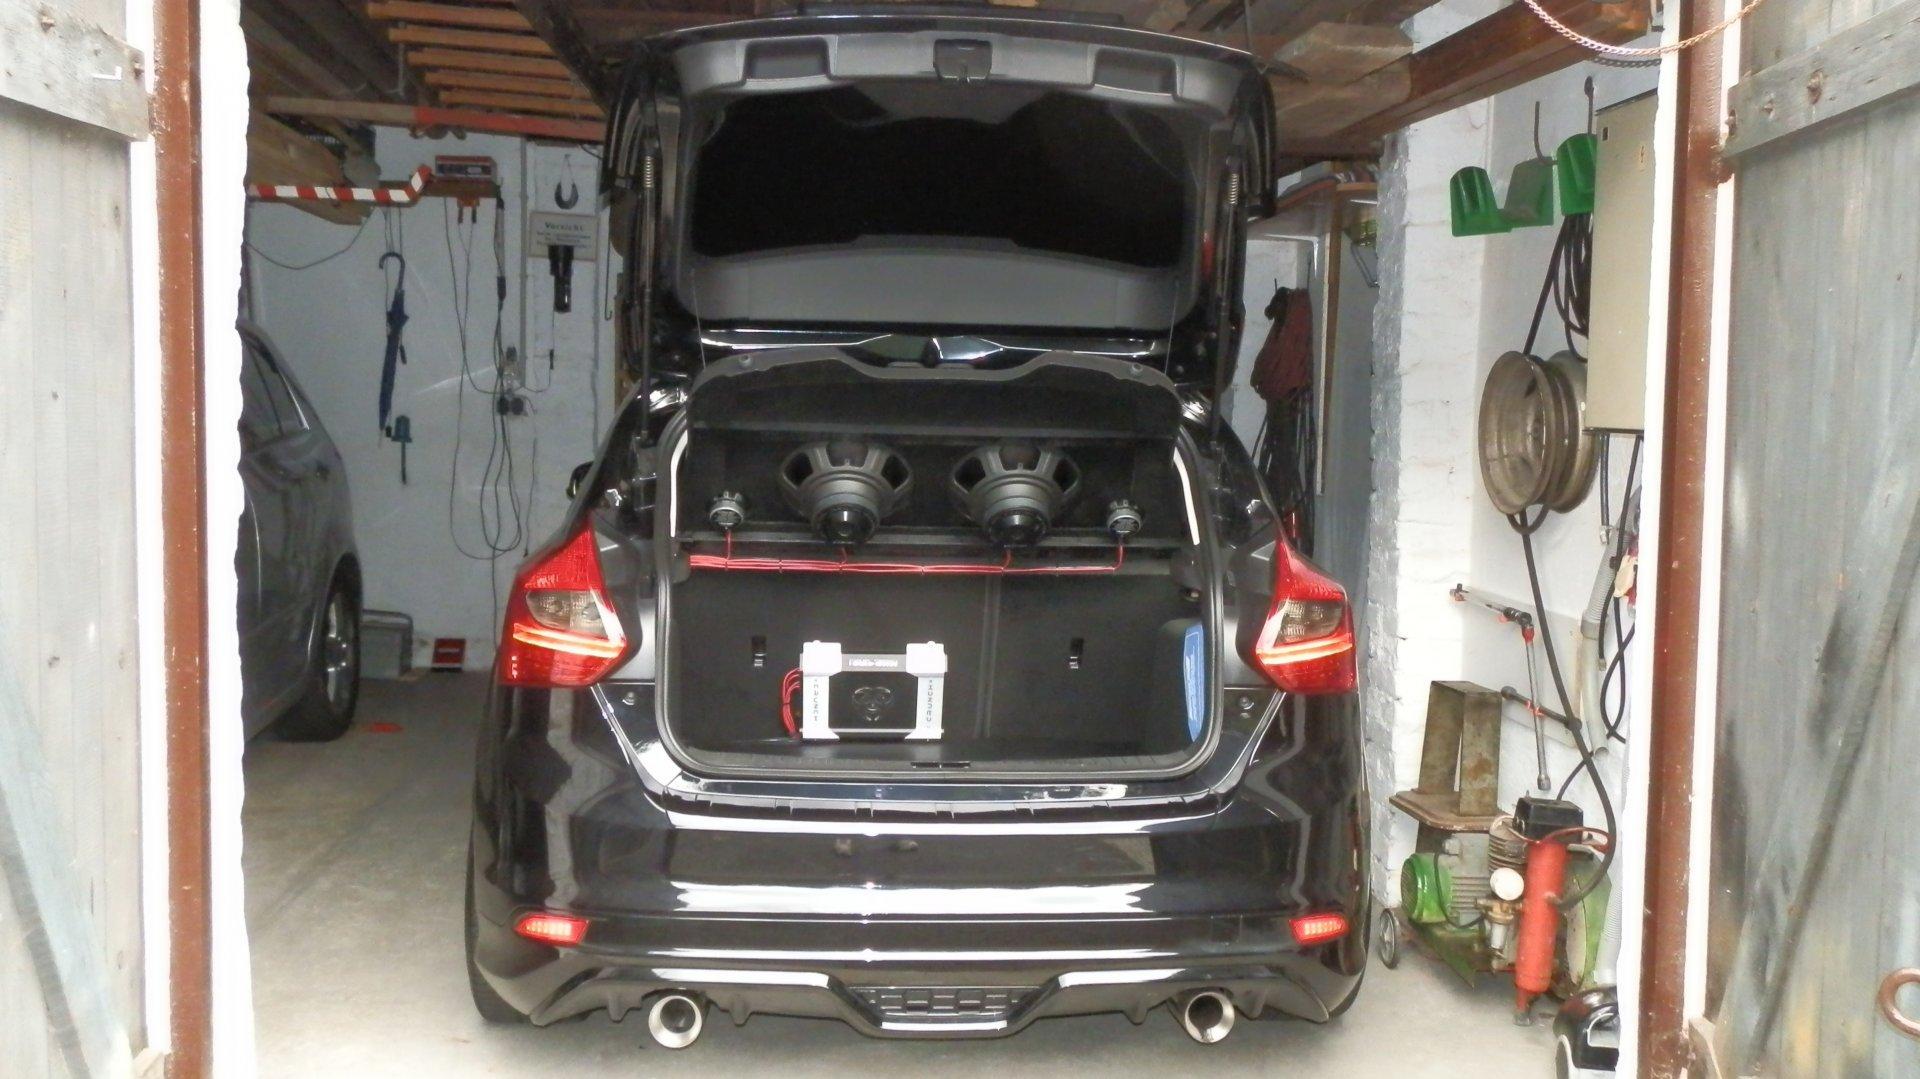 Ford Focus III (2016-06-30) - Verkleidung Heckklappe ST Charcä m. Endstufe u. Lautsprecher.JPG